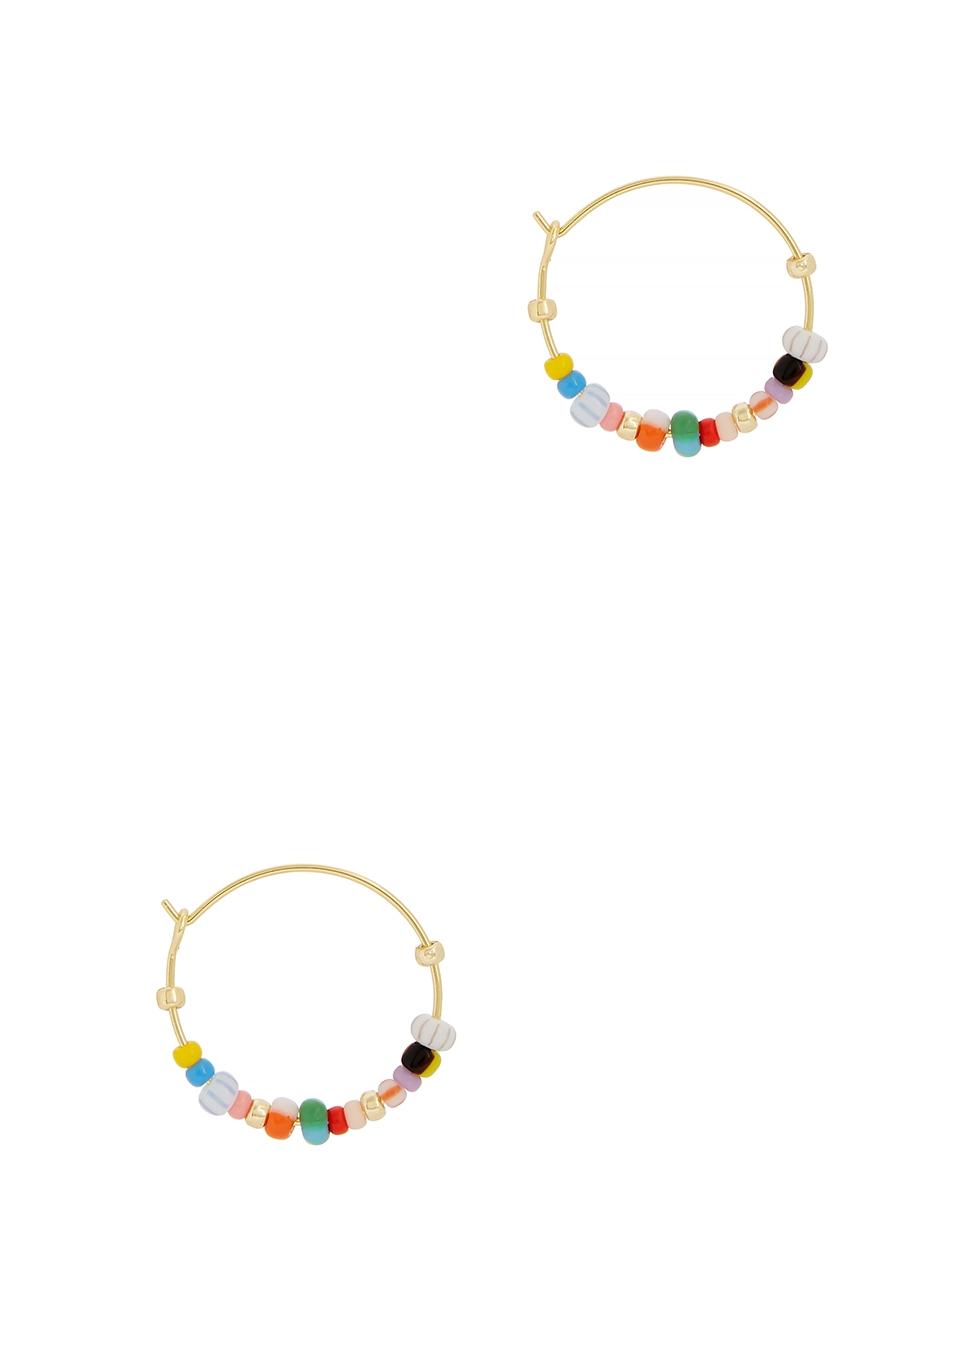 Golden Alaia beaded 18kt gold-plated hoop earrings